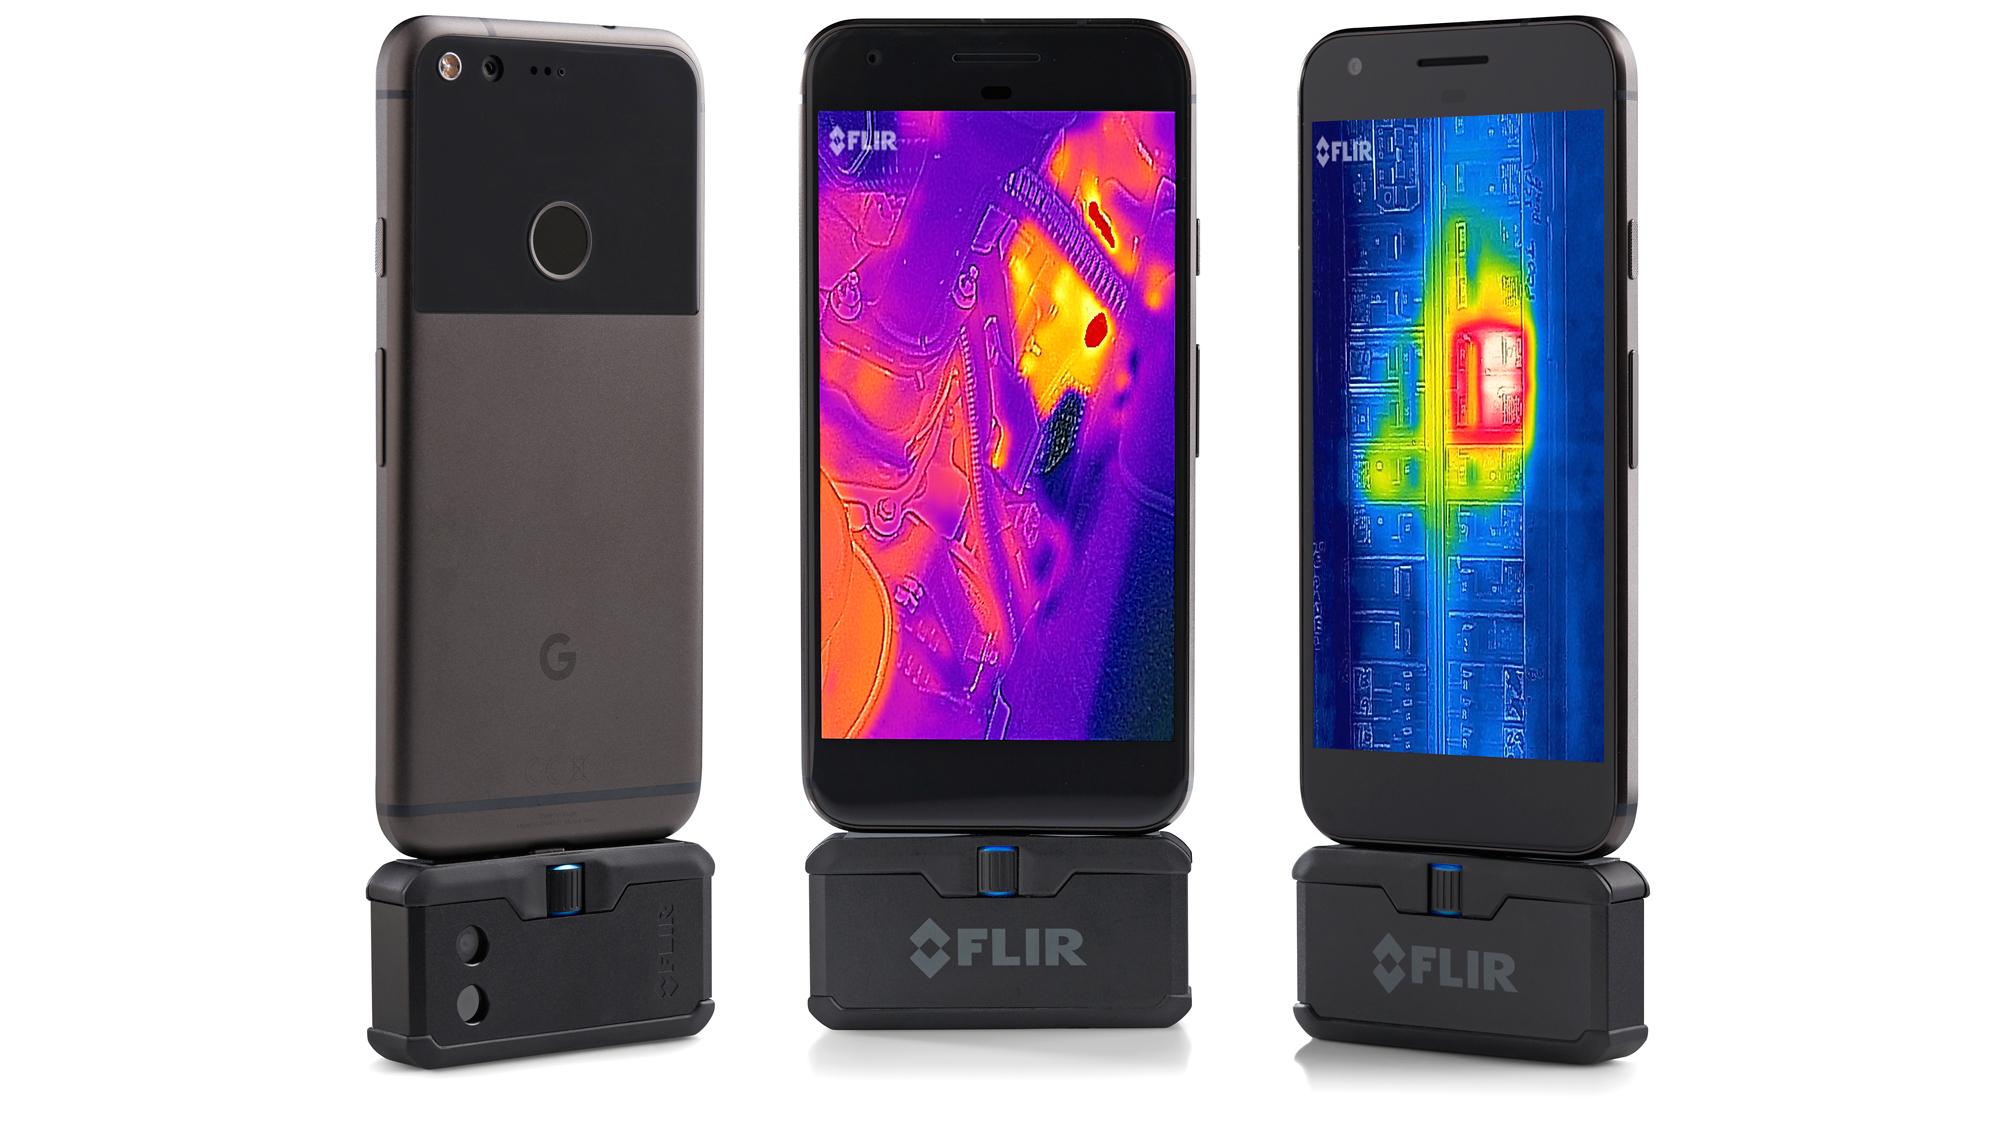 Flir One Android-warmtebeeldcamera